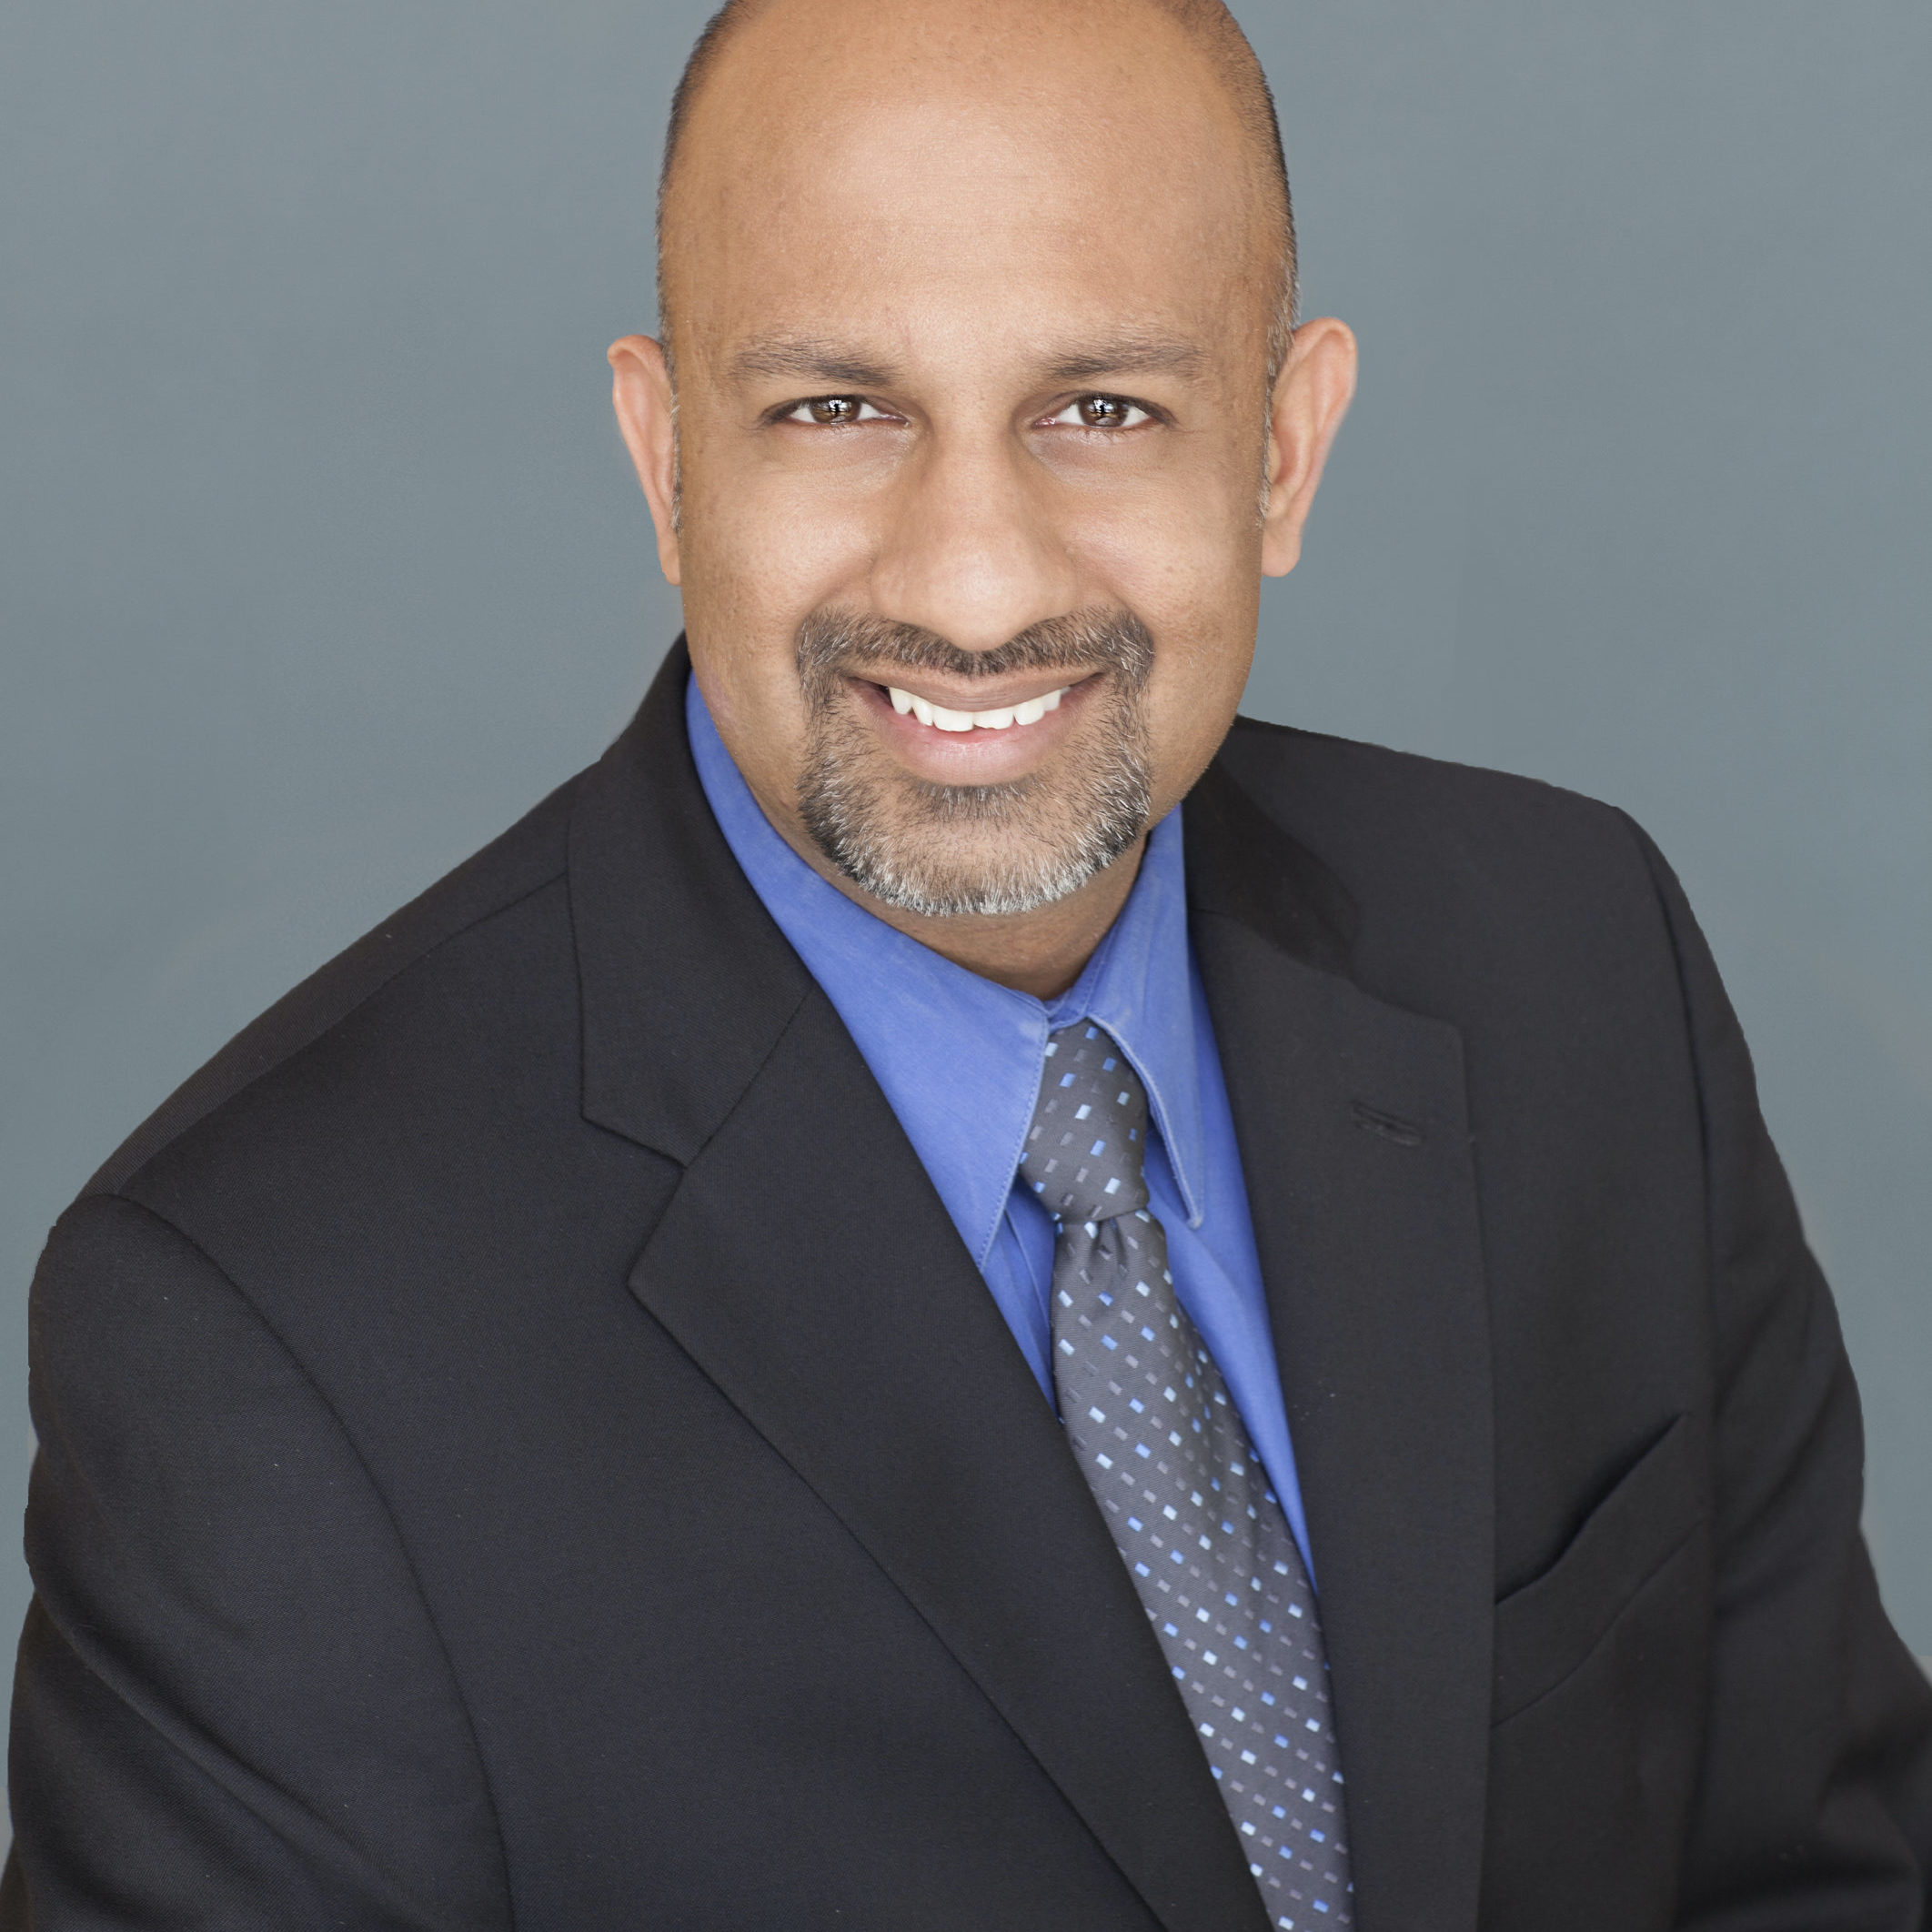 Neil_Gupta - Neil Gupta